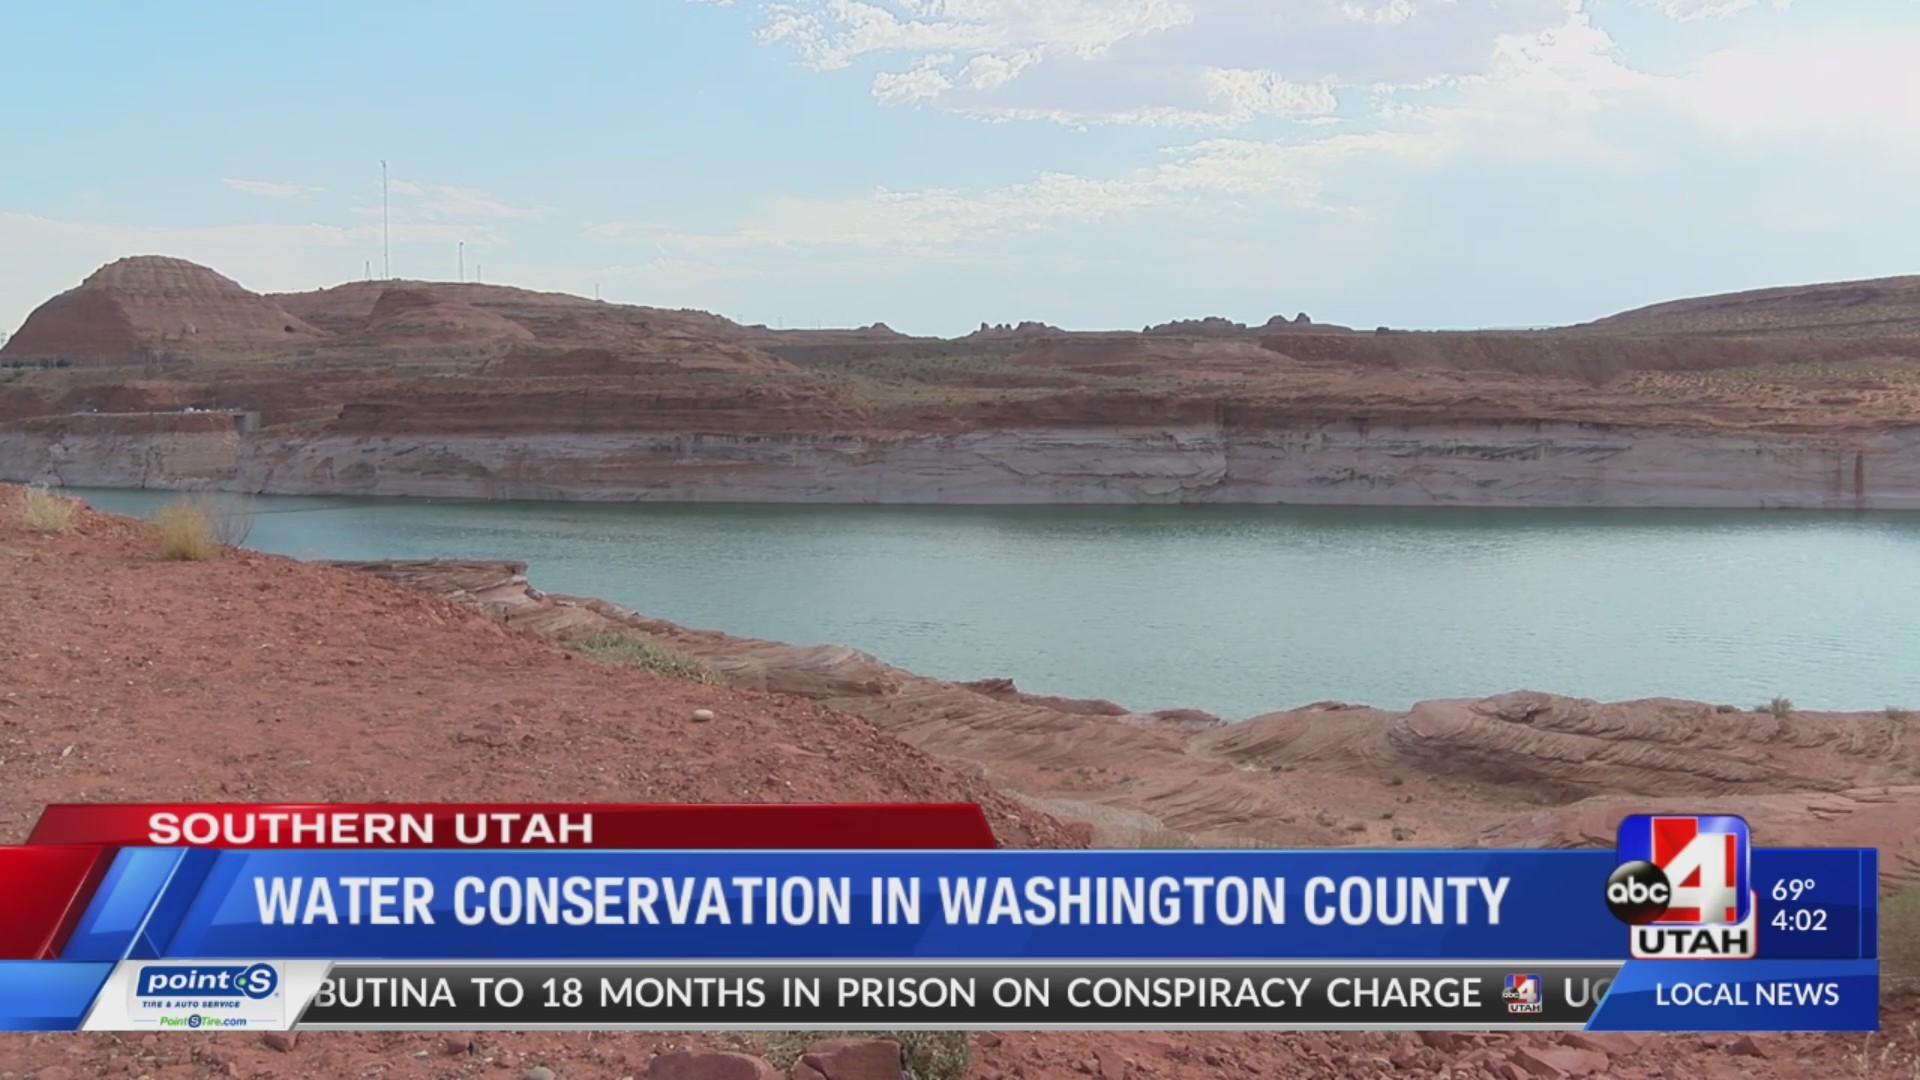 Washington_County_uses_less_water_than_o_0_20190426234732